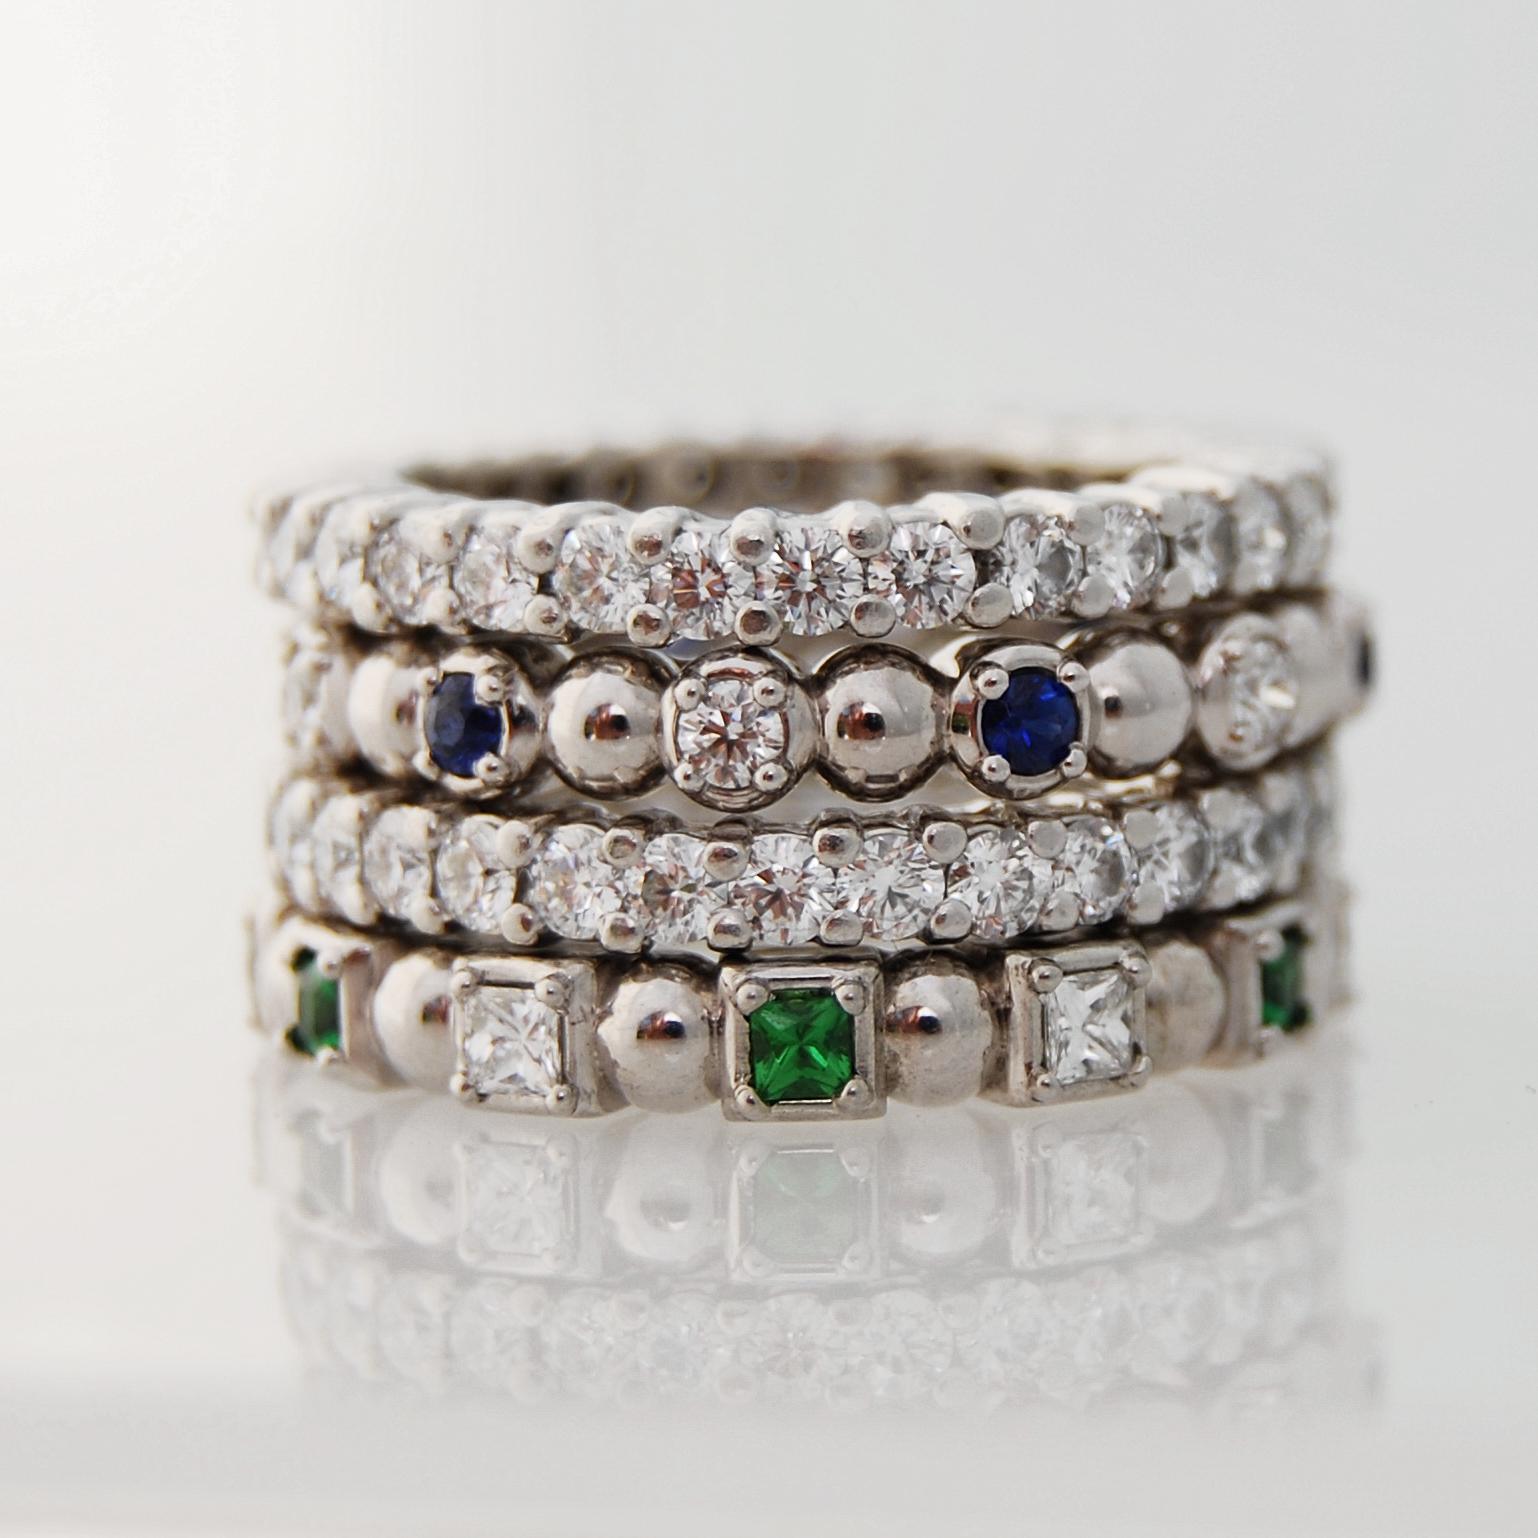 Newton custom jewelry designer